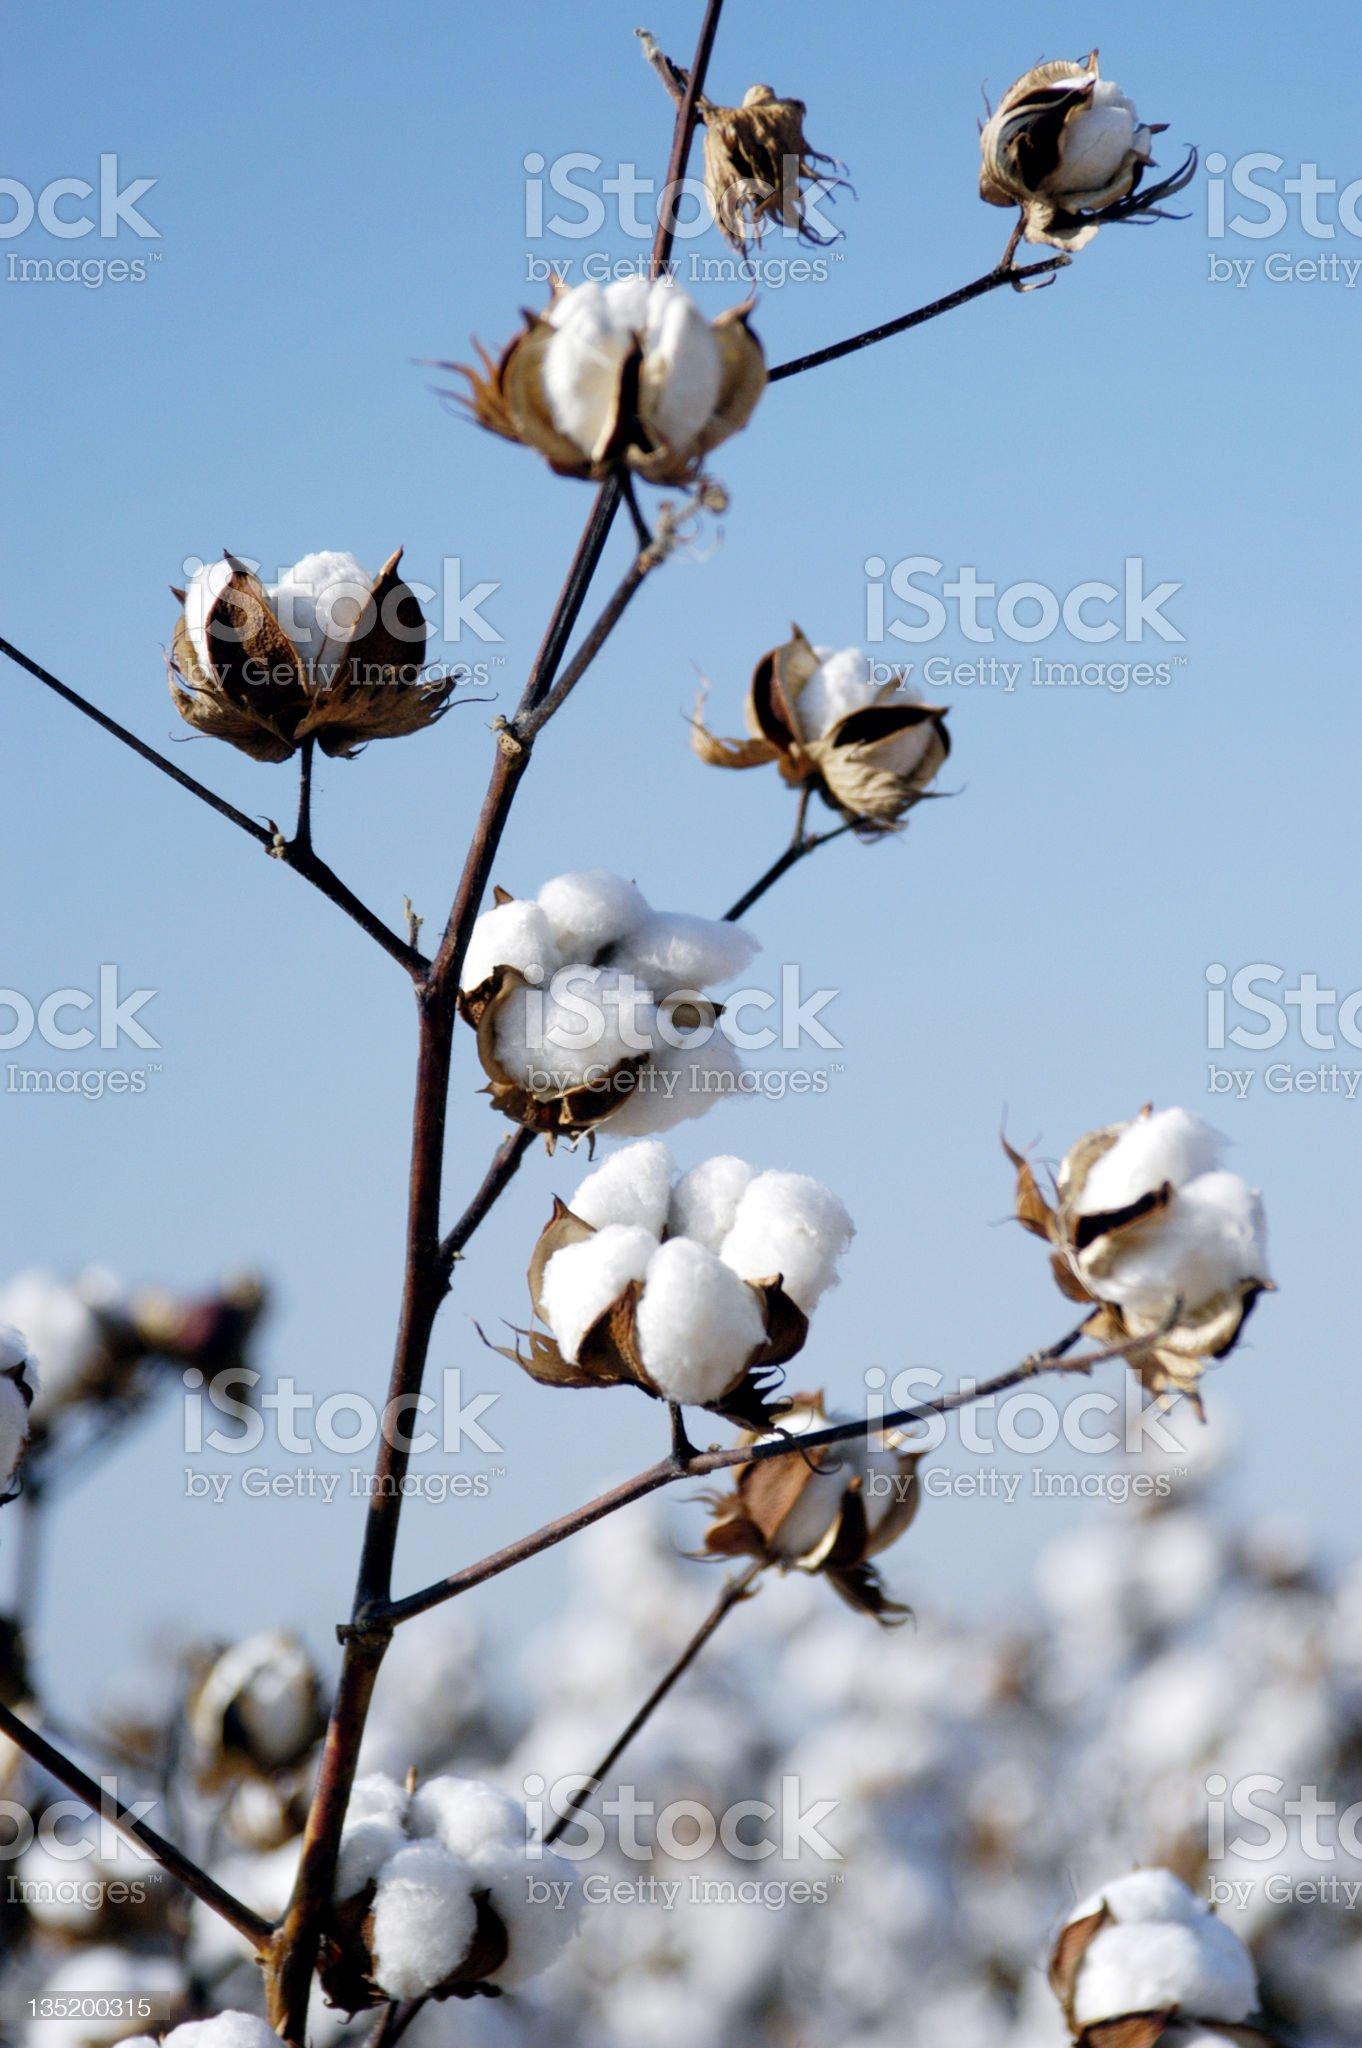 Cotton branch royalty-free stock photo